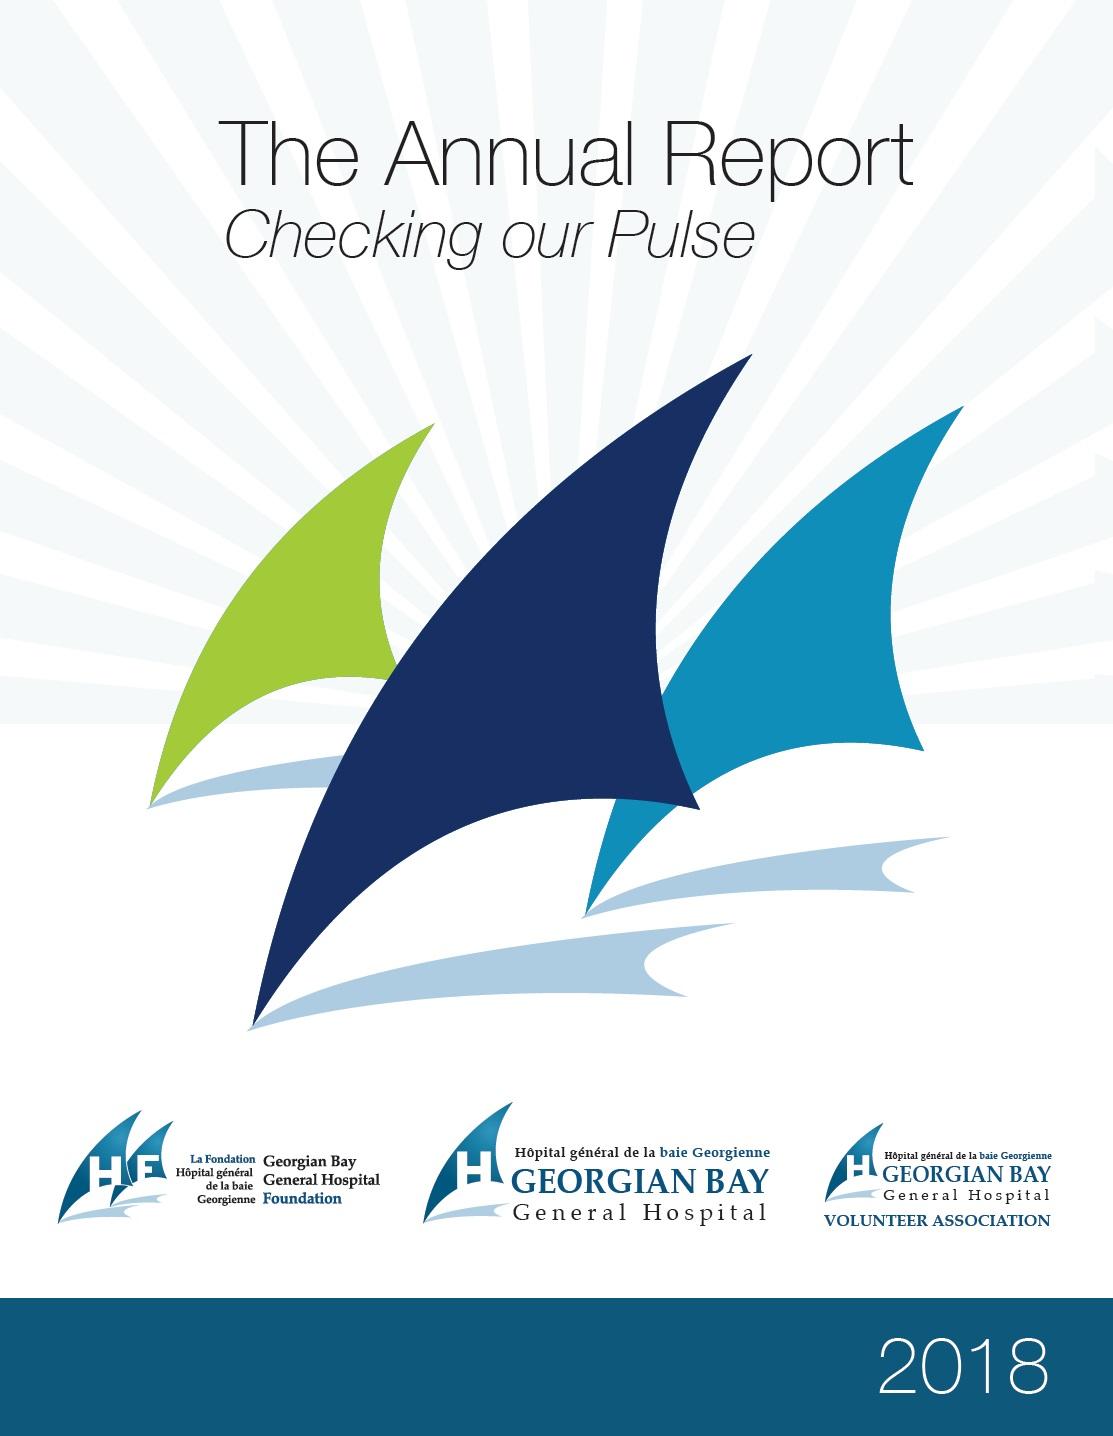 2018 Annual Report Cover